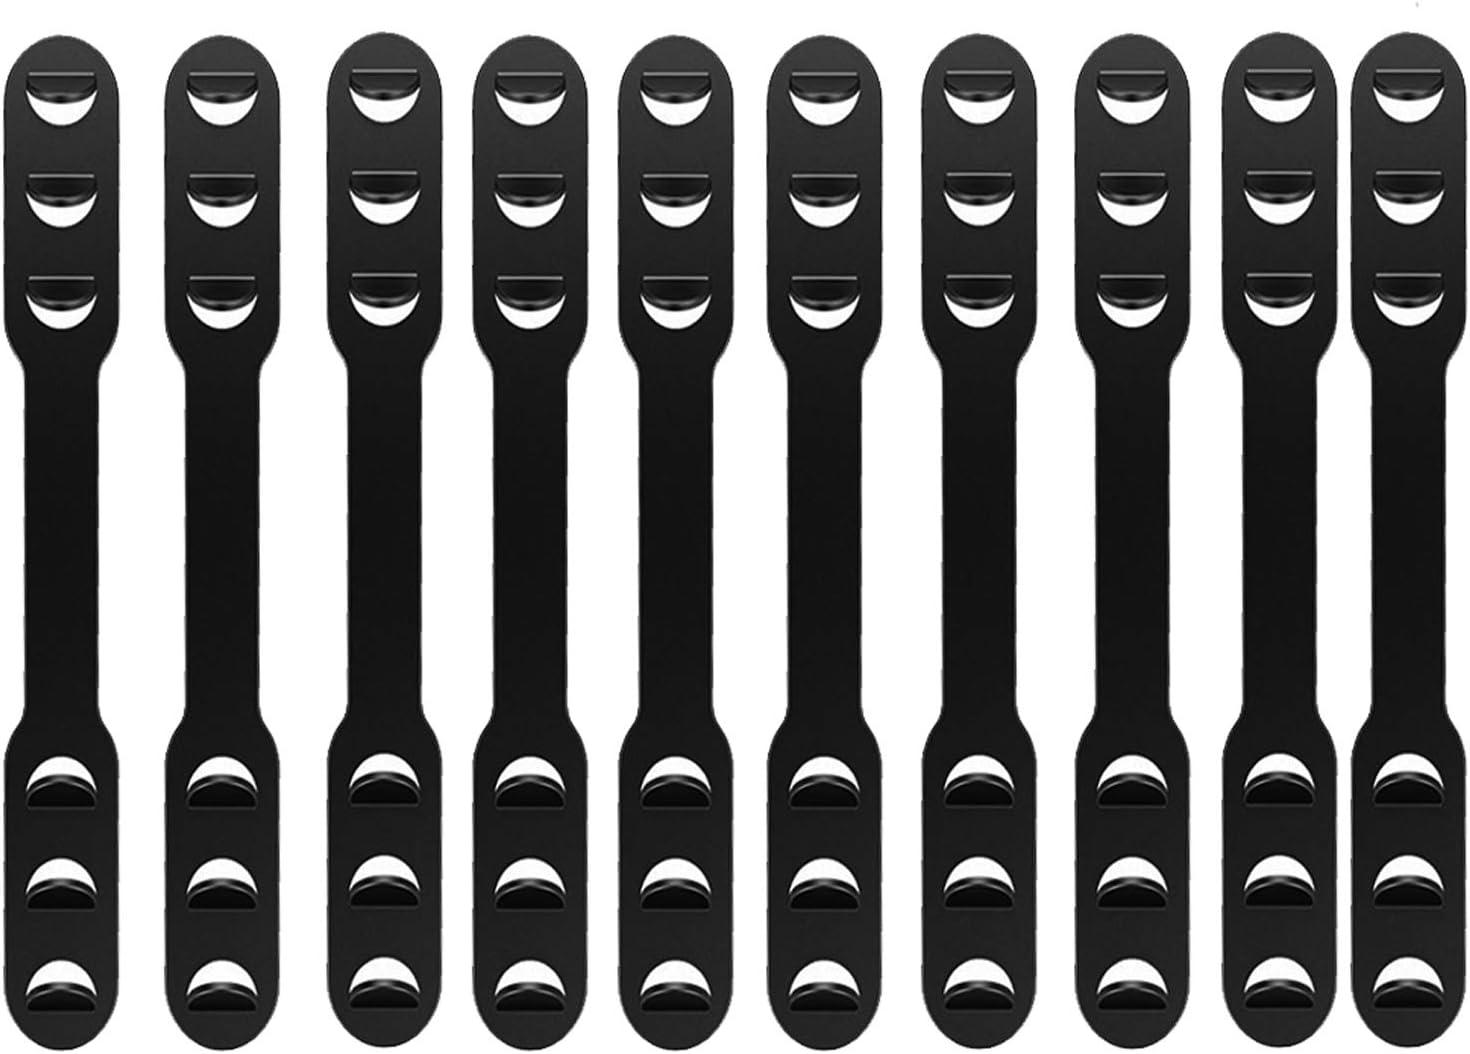 Rapid rise Fukep 10 Pcs Mask Ear Translated Strap Black Masks S Hook Adjustable Buckle